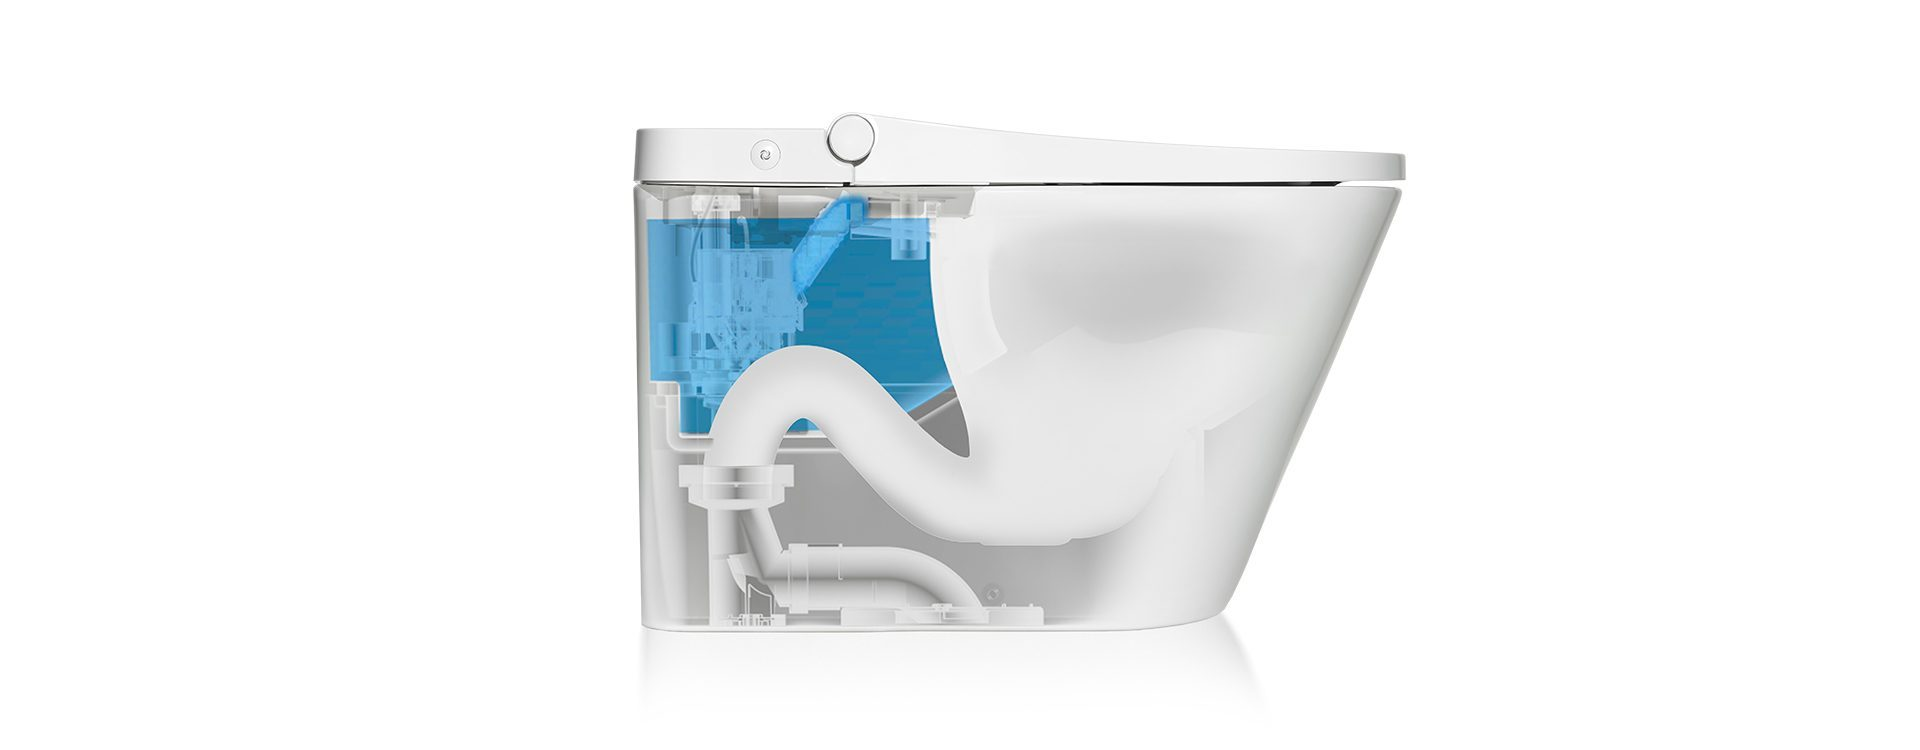 Eco-friendly flushing technology.